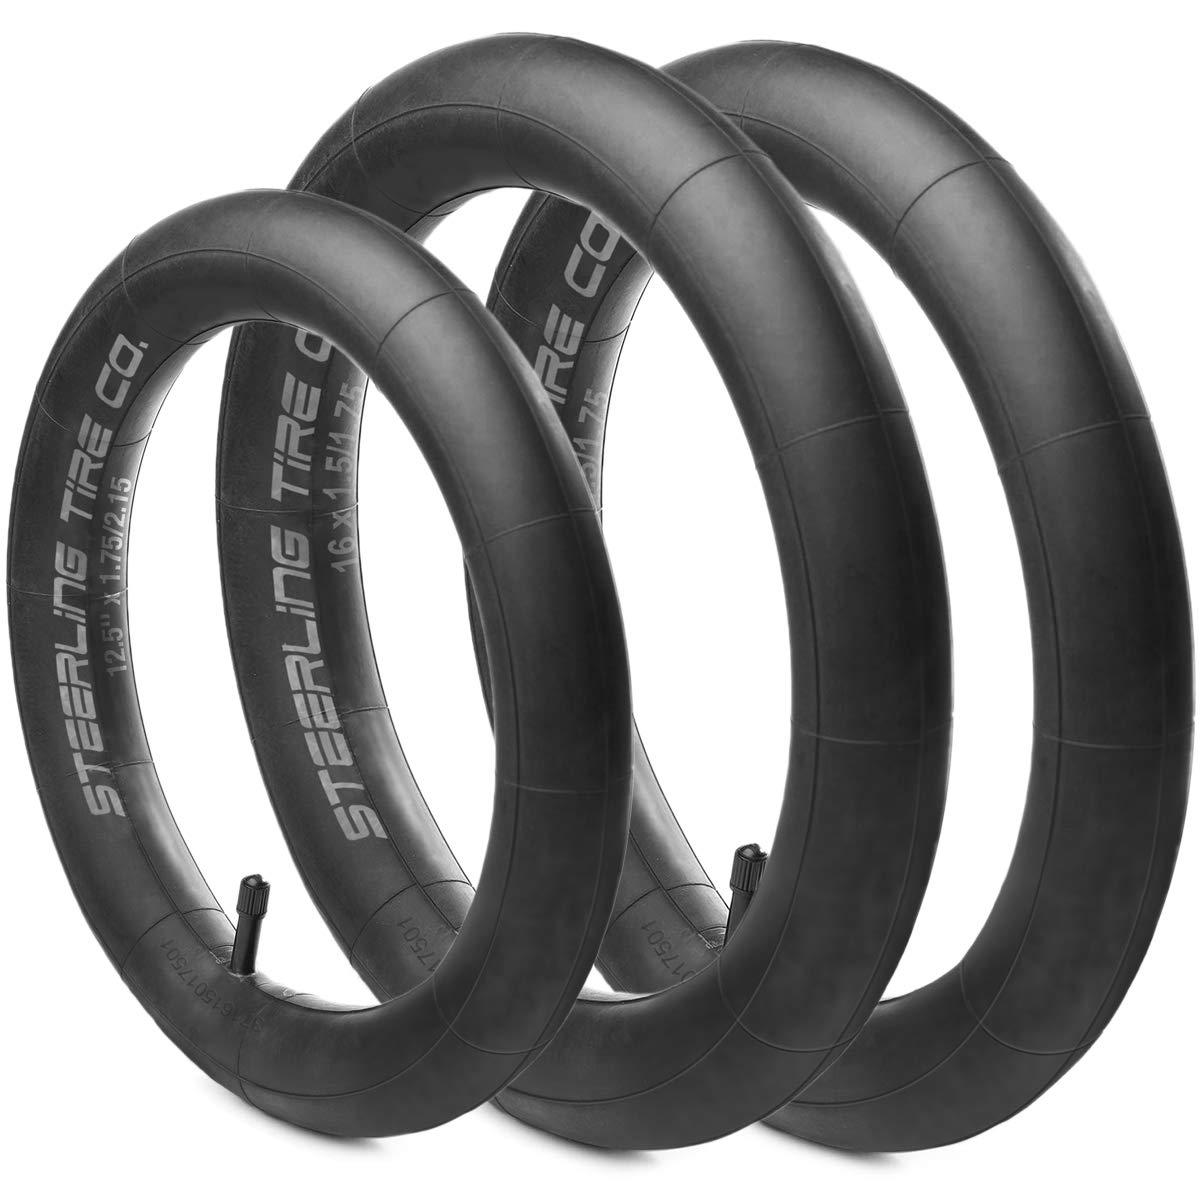 Steerling Tire Co Two 16'' x 1.5/1.75 R & One 12.5'' x 1.75/2.15 F Heavy Duty Thorn Resistant Inner Tire Tube For All BOB Revolution Strollers & Stroller Strides - Smart BOB Stroller Tire Set - 3 Pack